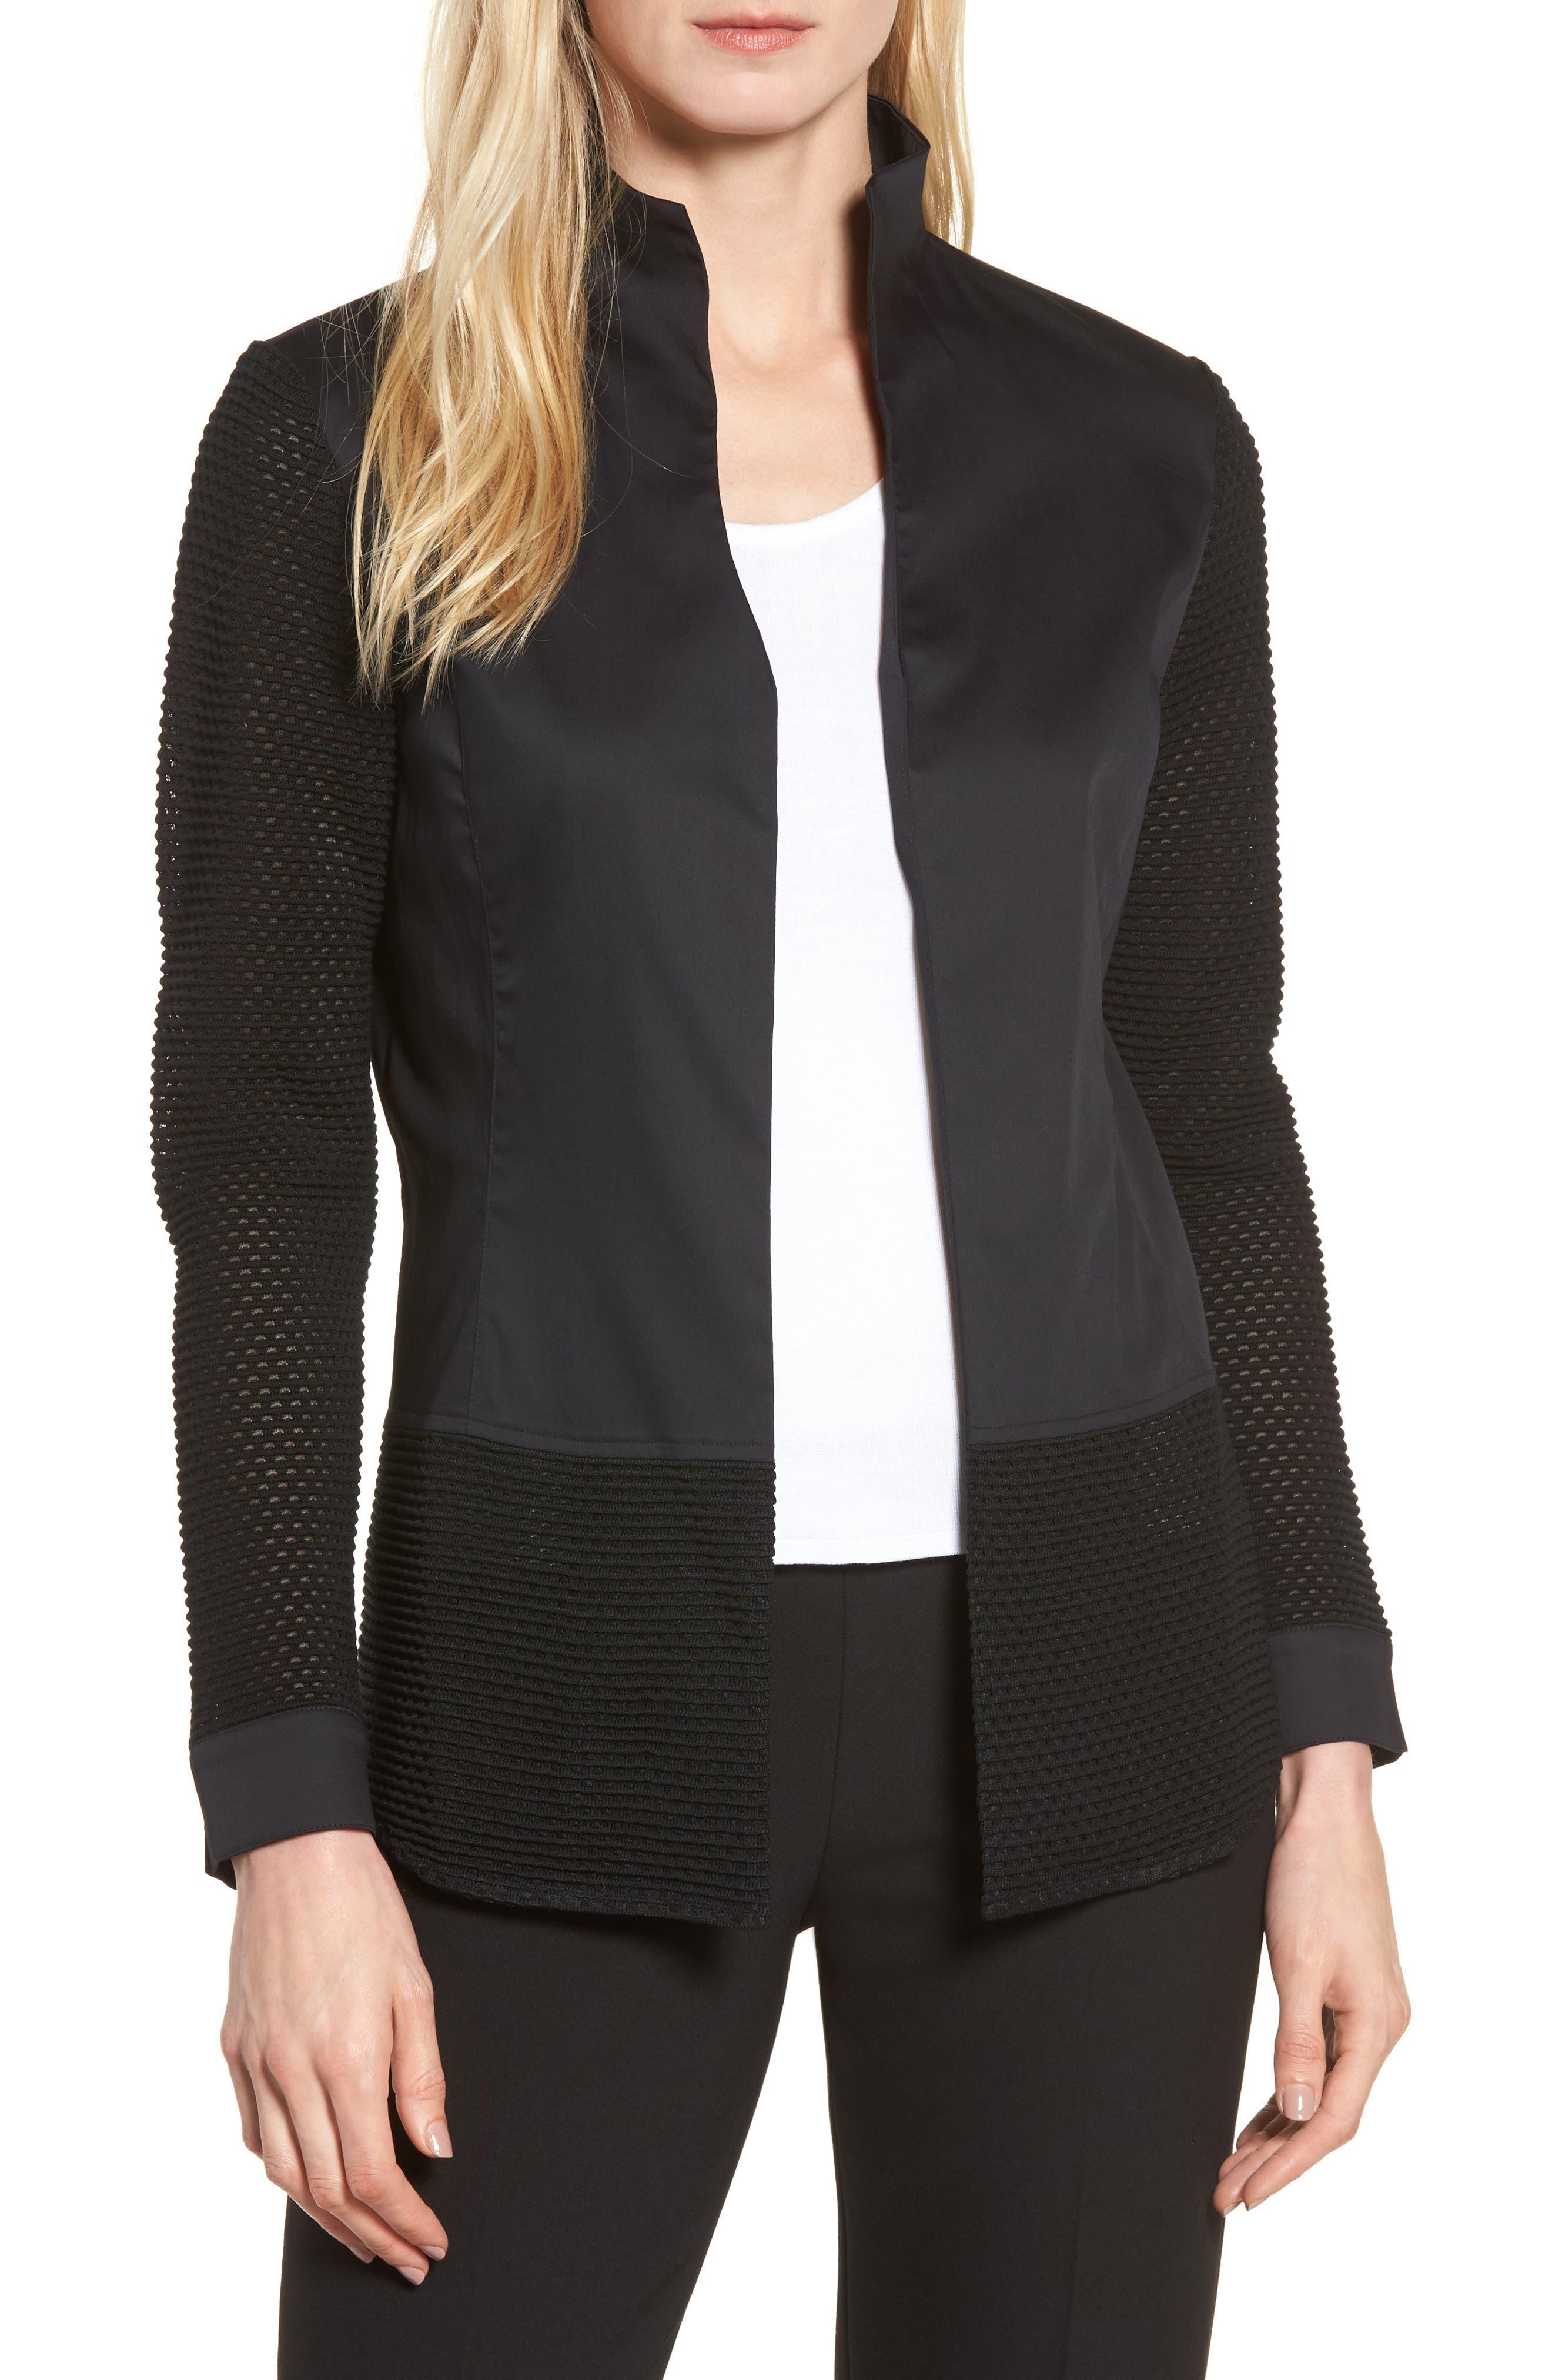 Woven & Knit Jacket,                             Main thumbnail 1, color,                             Black